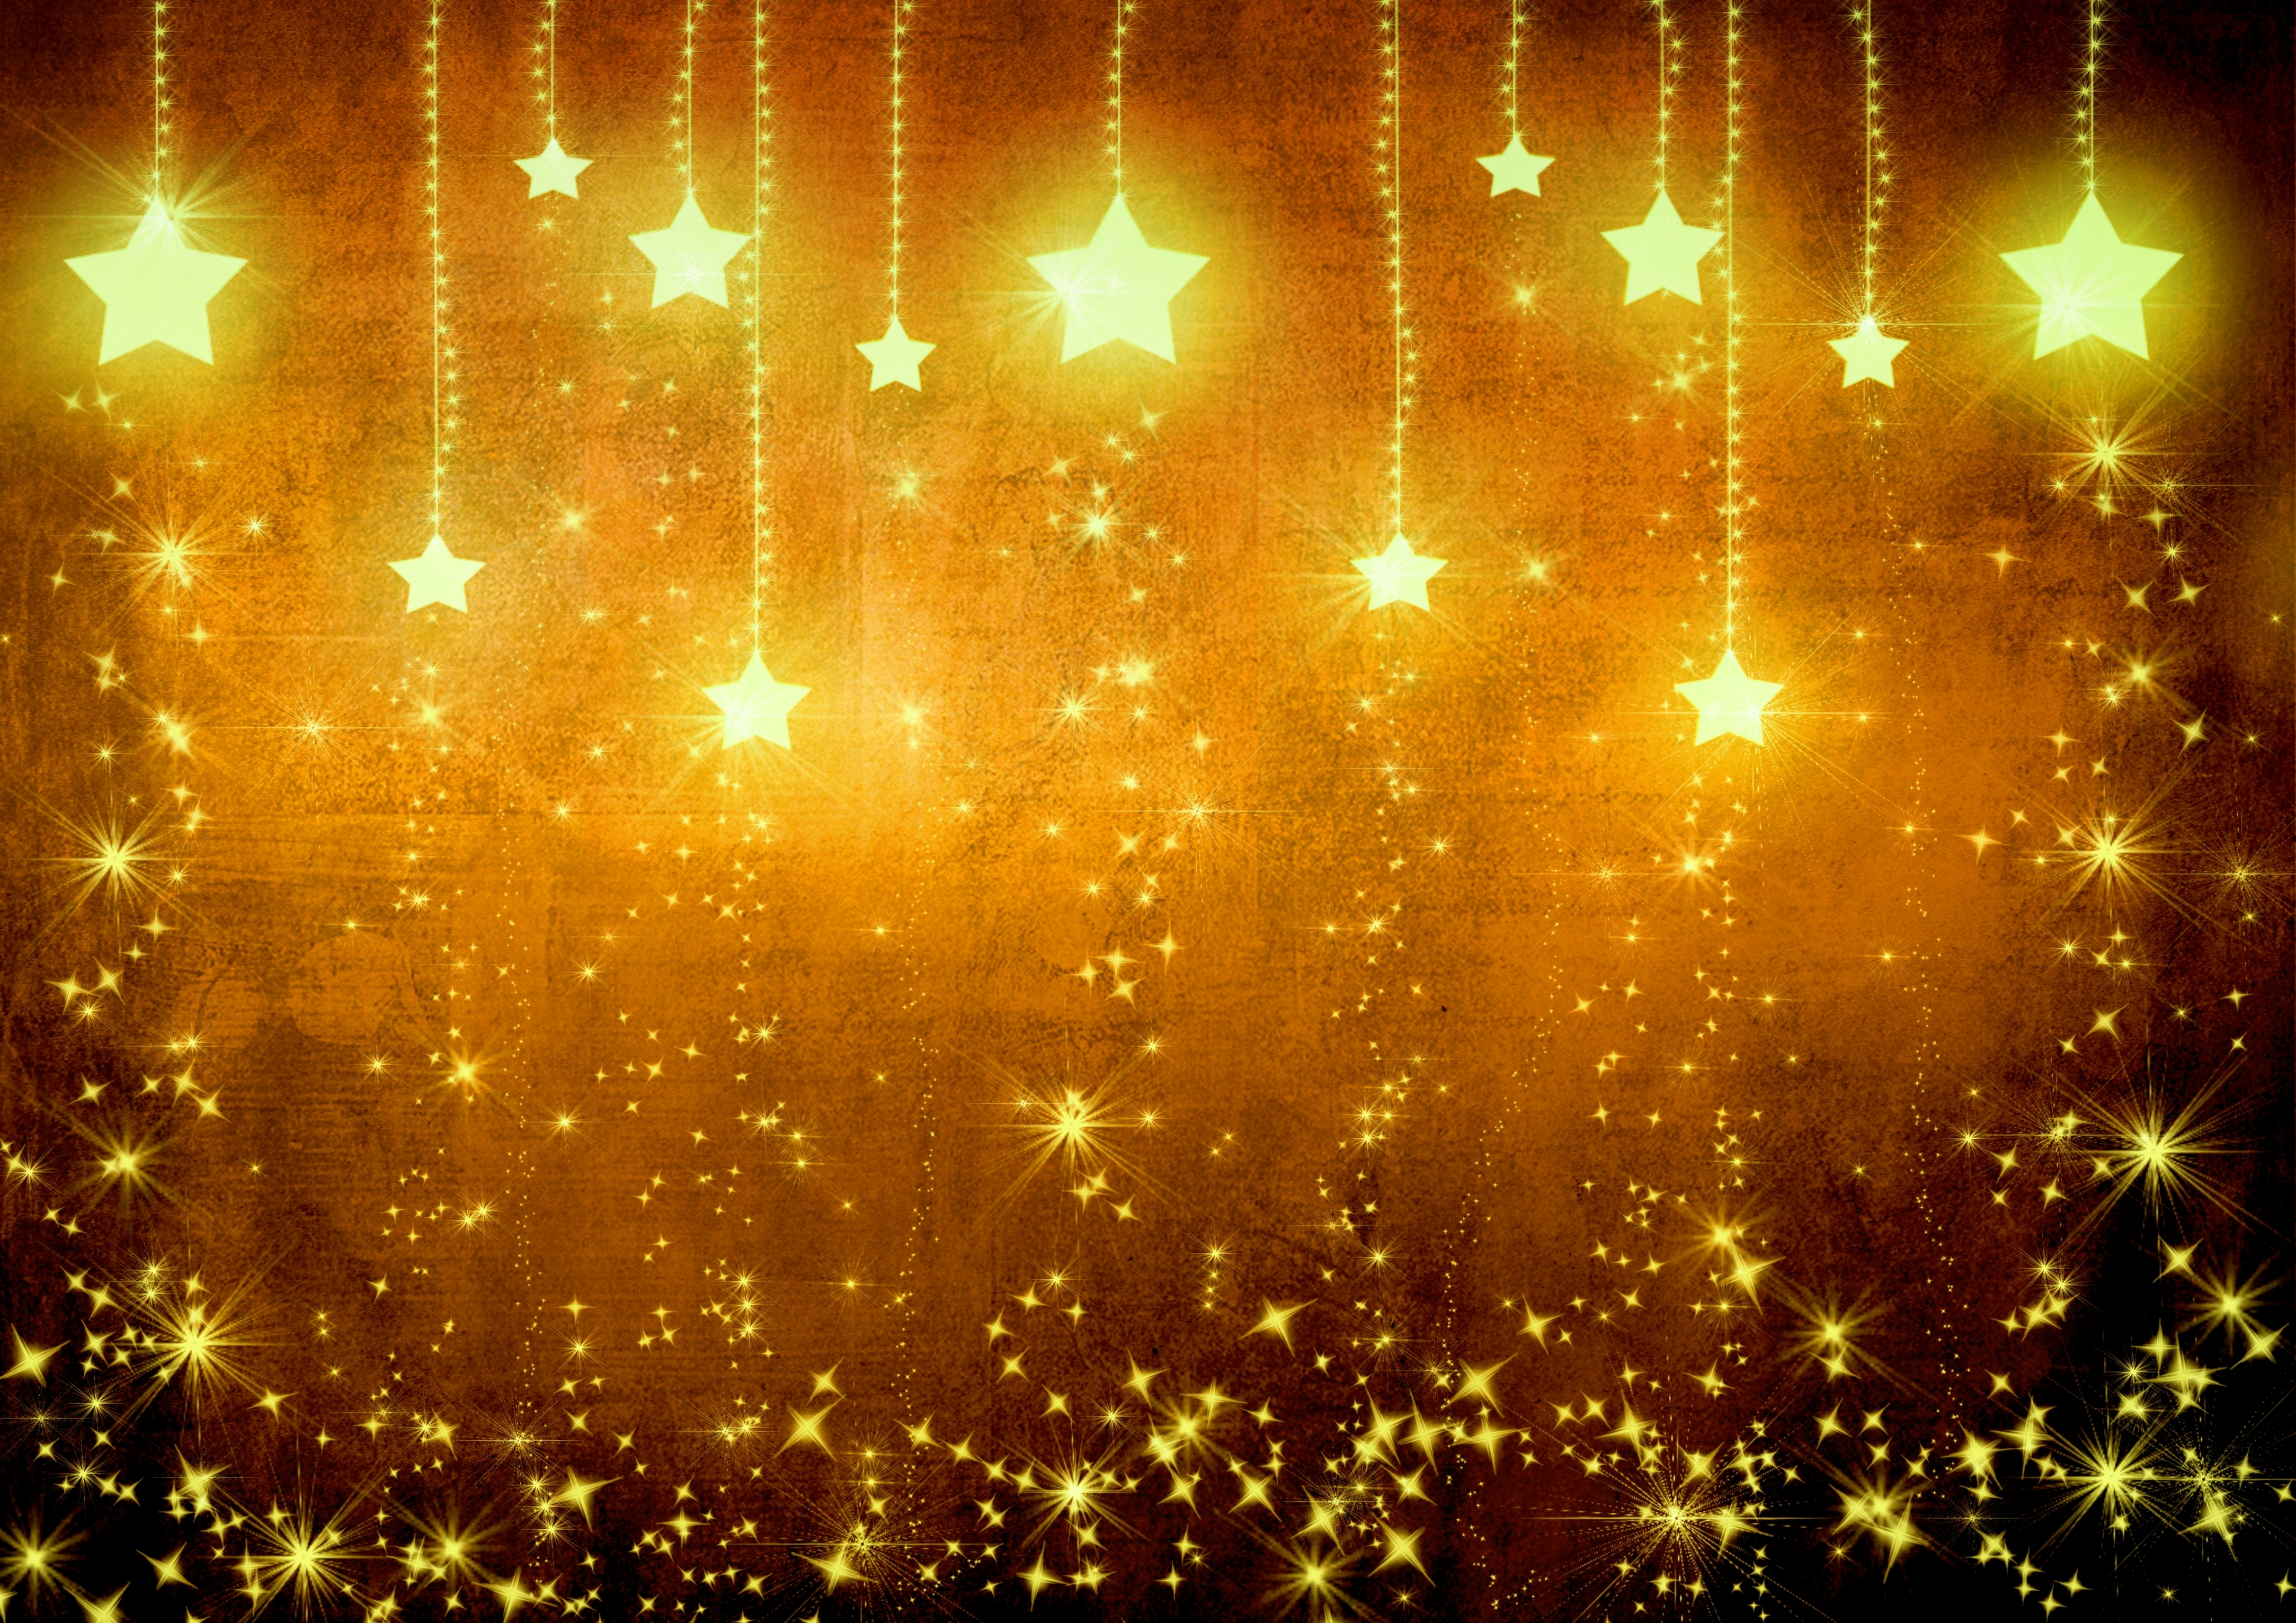 holiday lights wallpaper - wallpapersafari